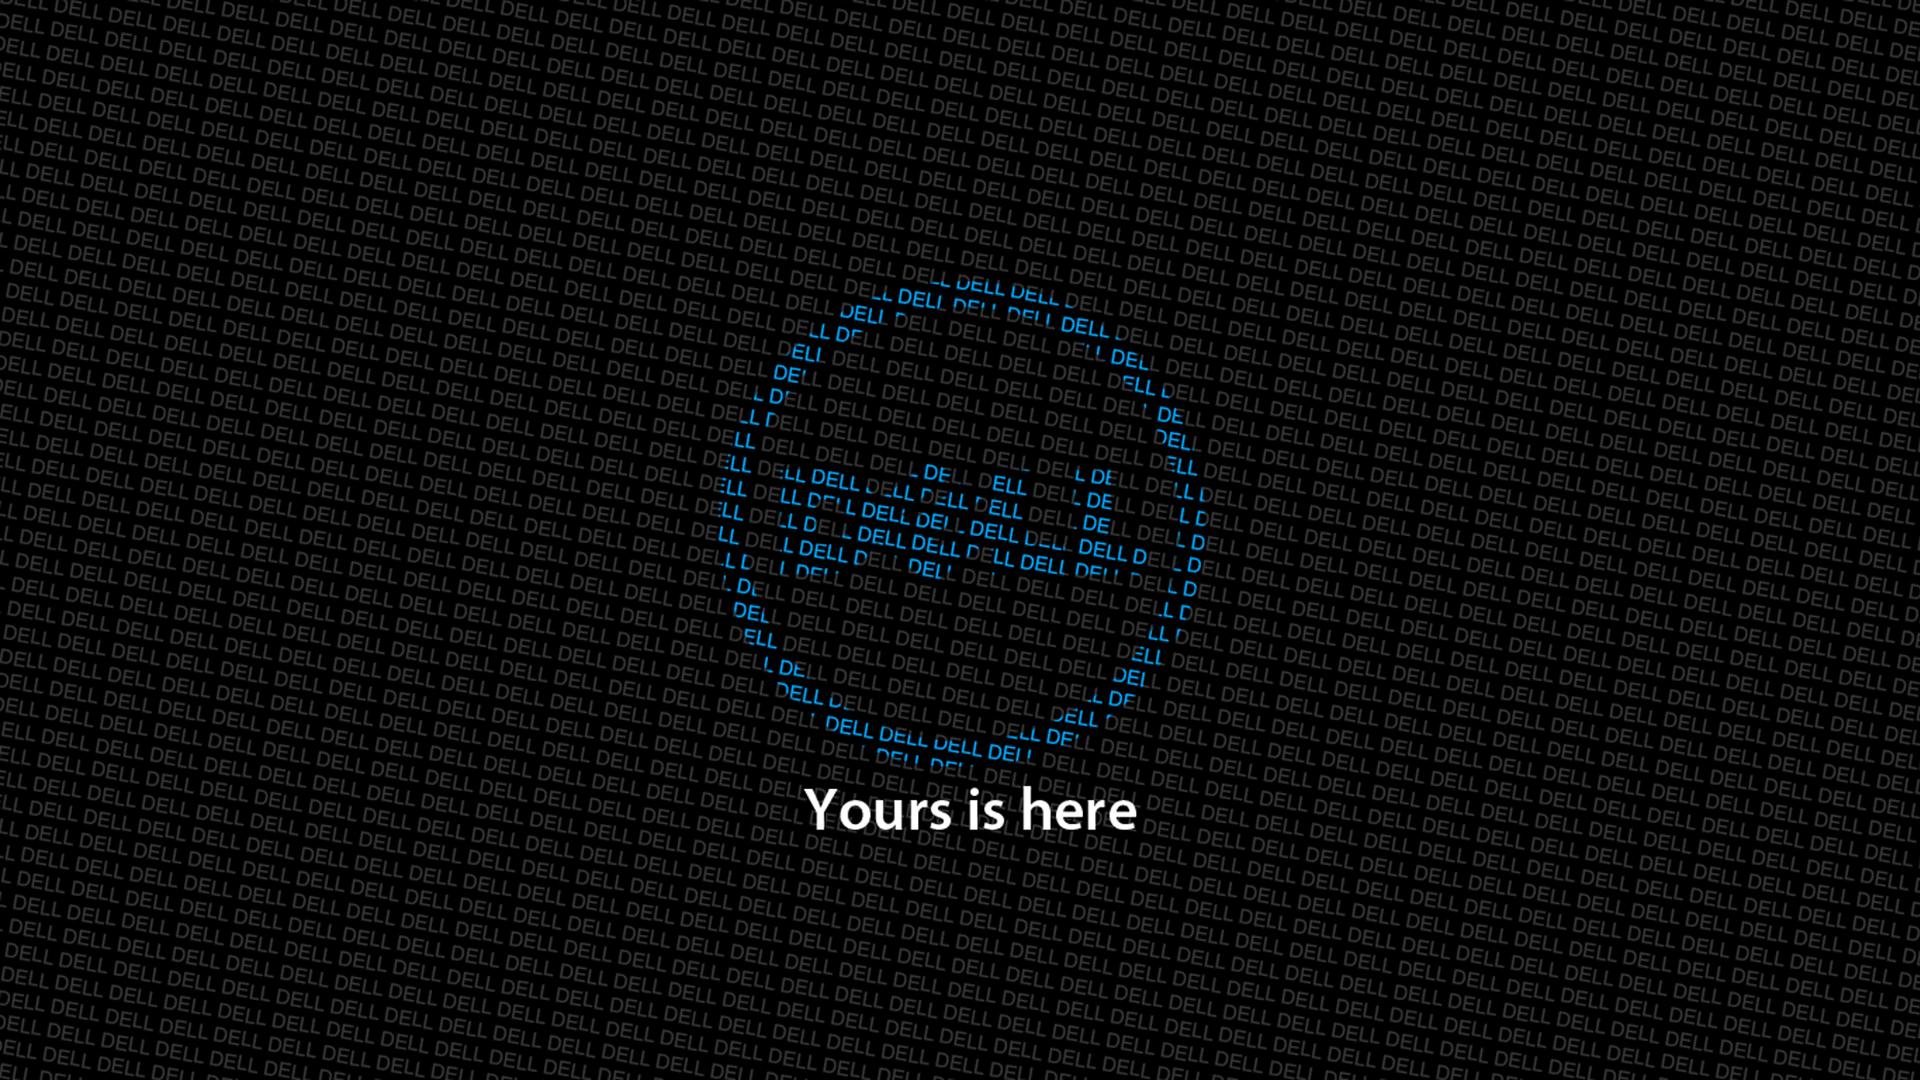 Dell Widescreen Desktop Background 879 1920x1080 px 1920x1080